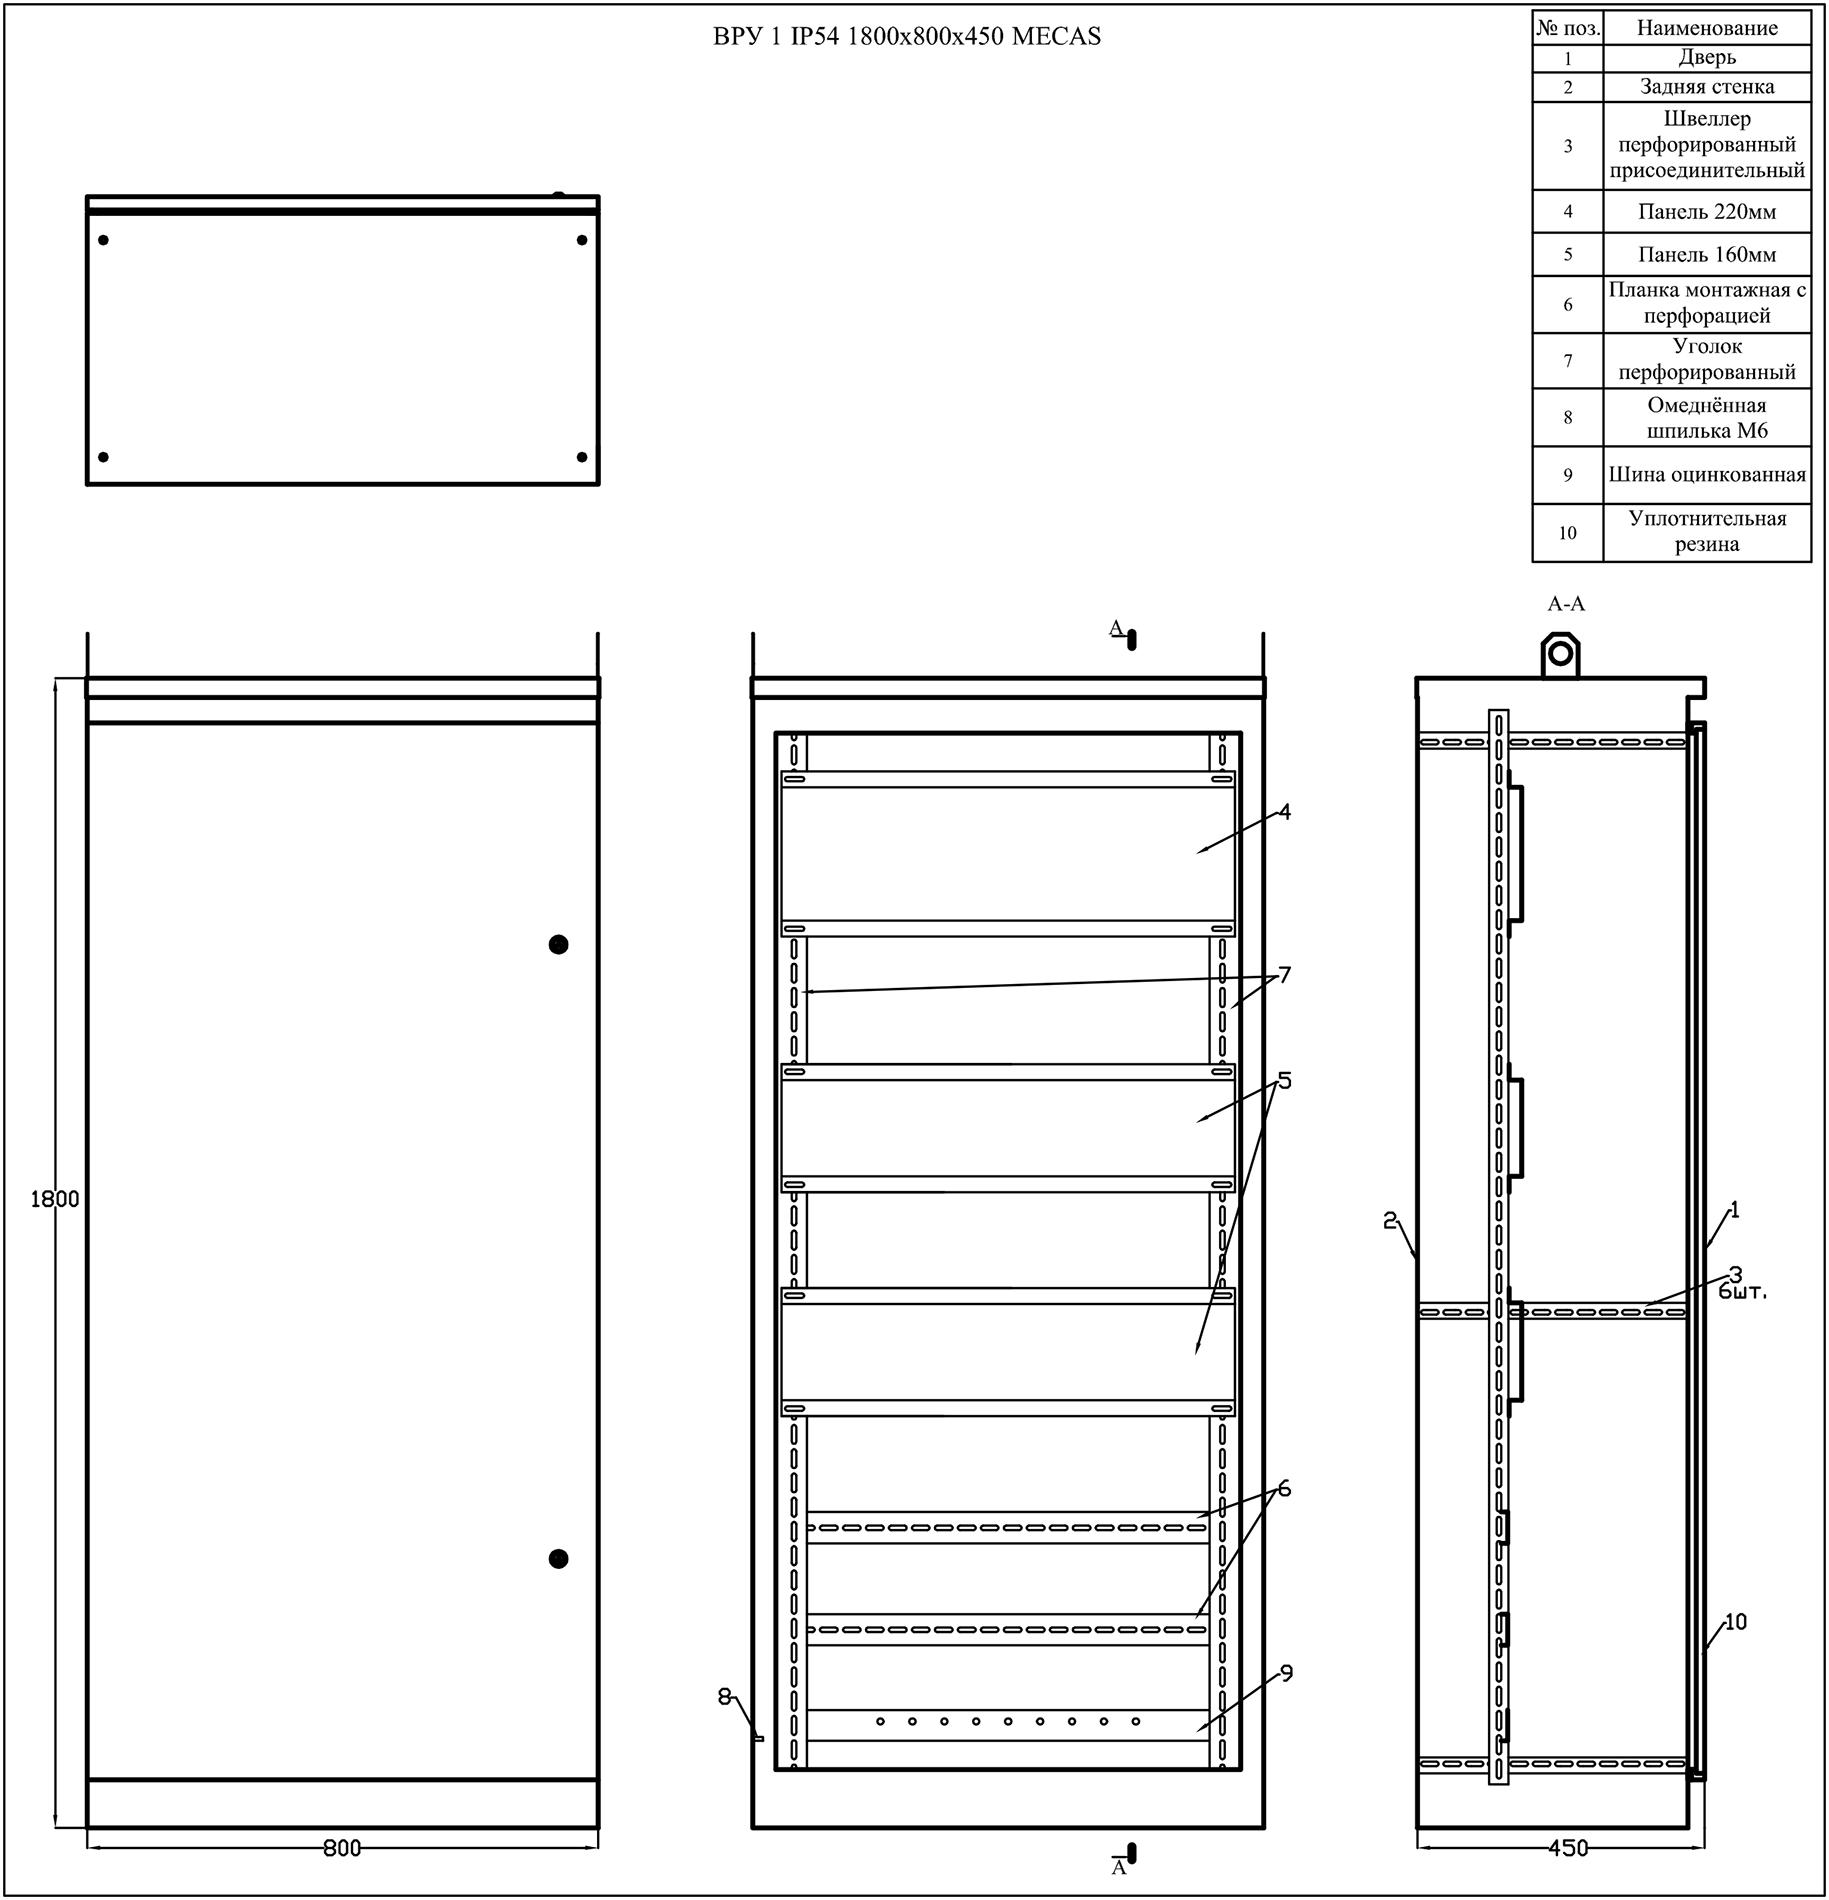 Корпус ВРУ-1 IP54 1800х800х450 MECAS